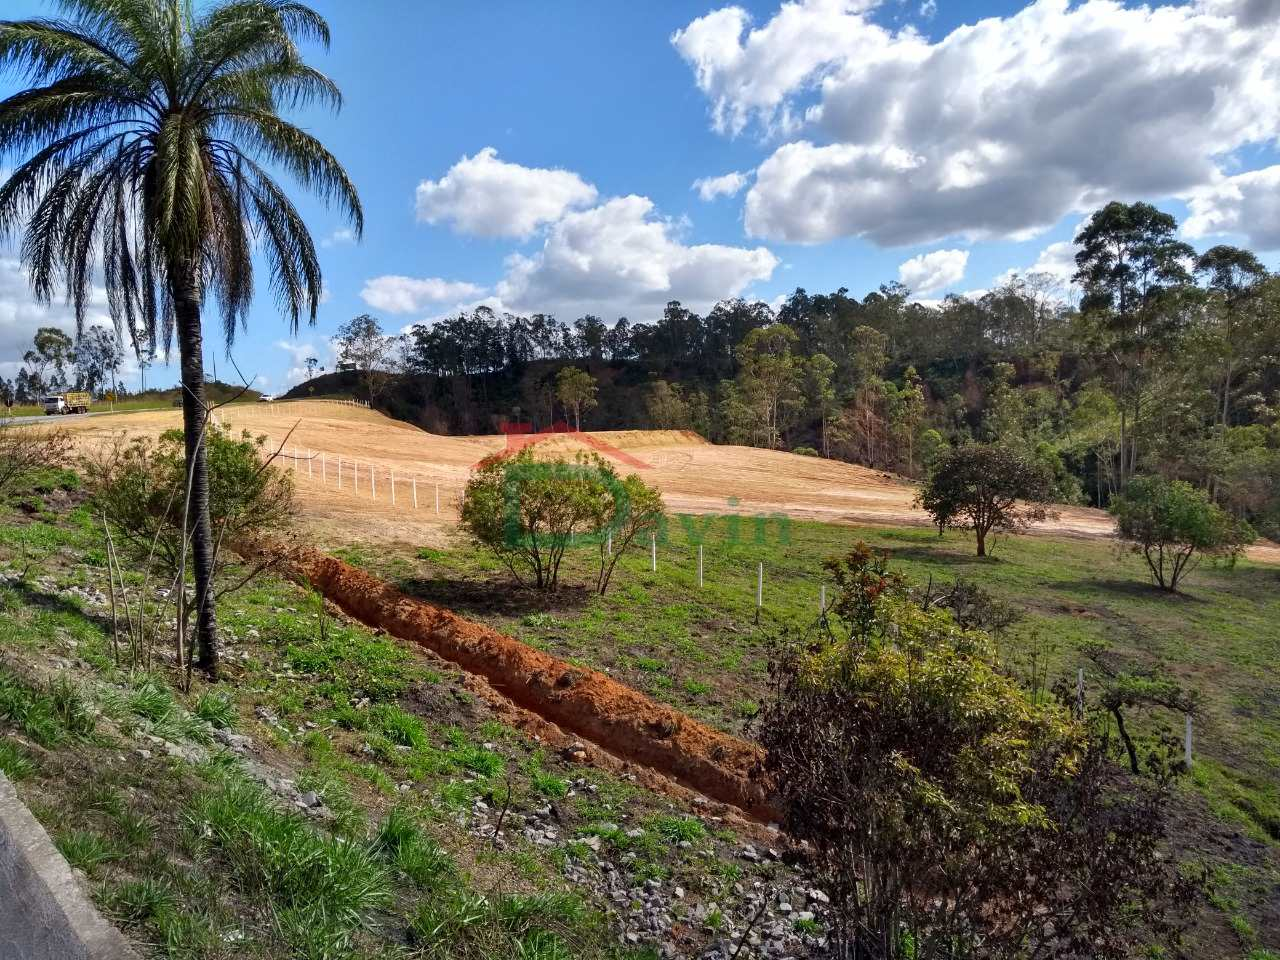 Terreno, BR 265, São João Del Rei - R$ 390 mil, Cod: 255